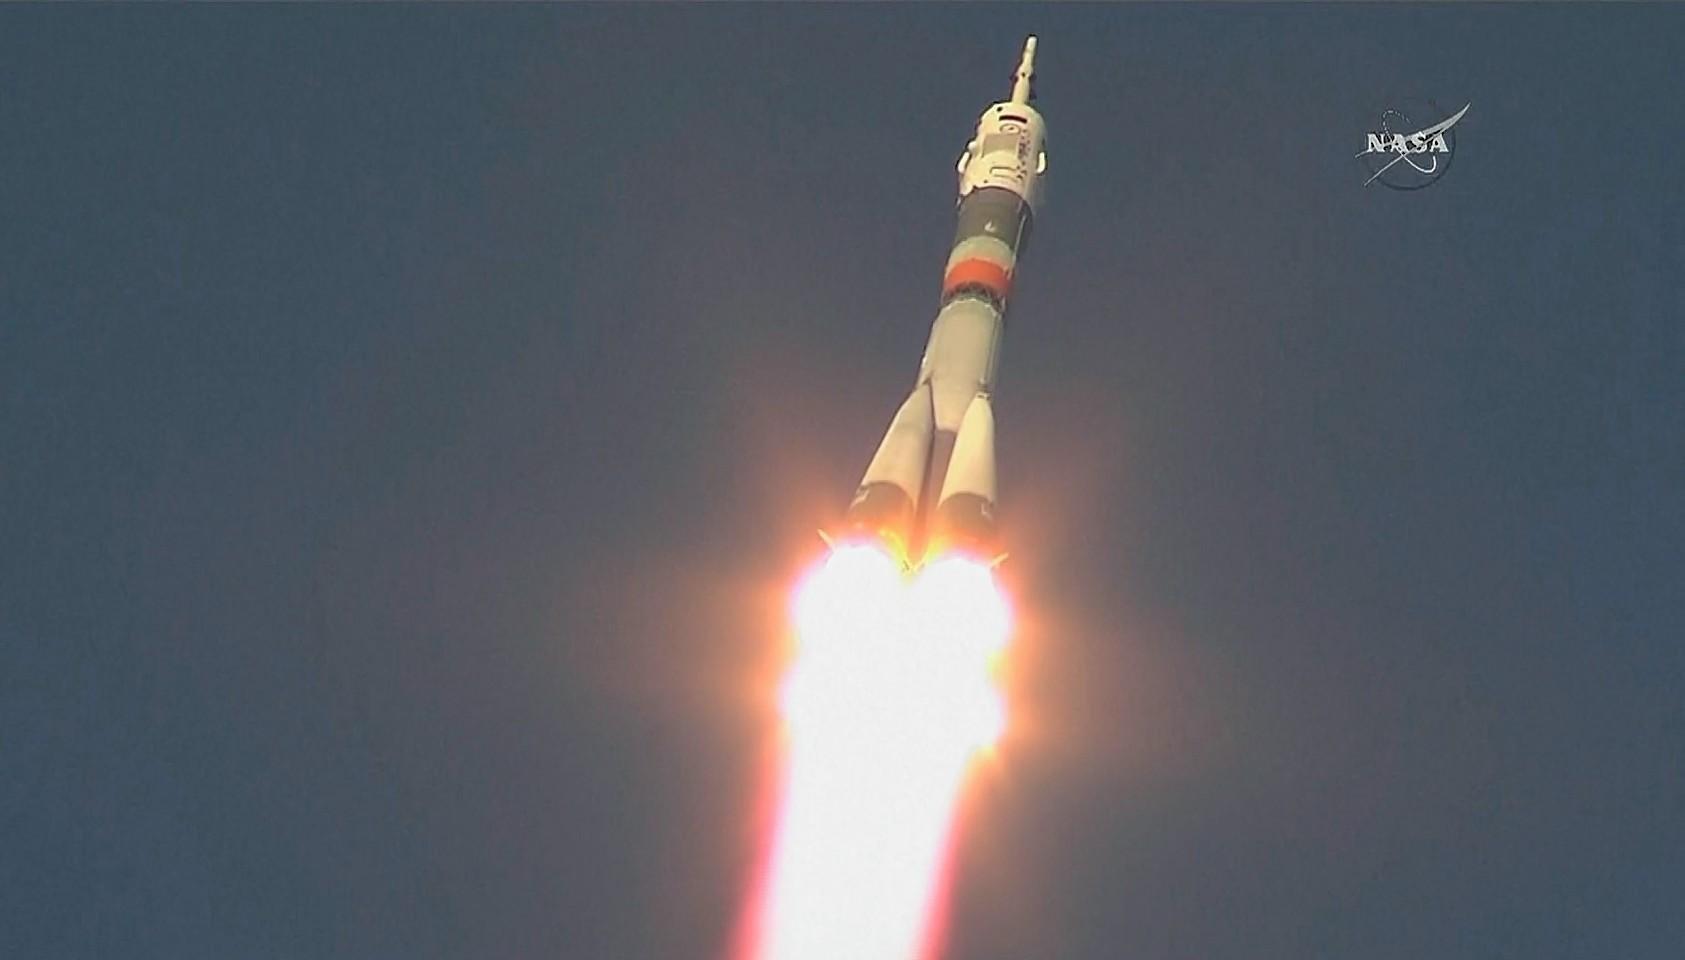 The rocket carrying Briton Tim Peake on his landmark flight to the International Space Station